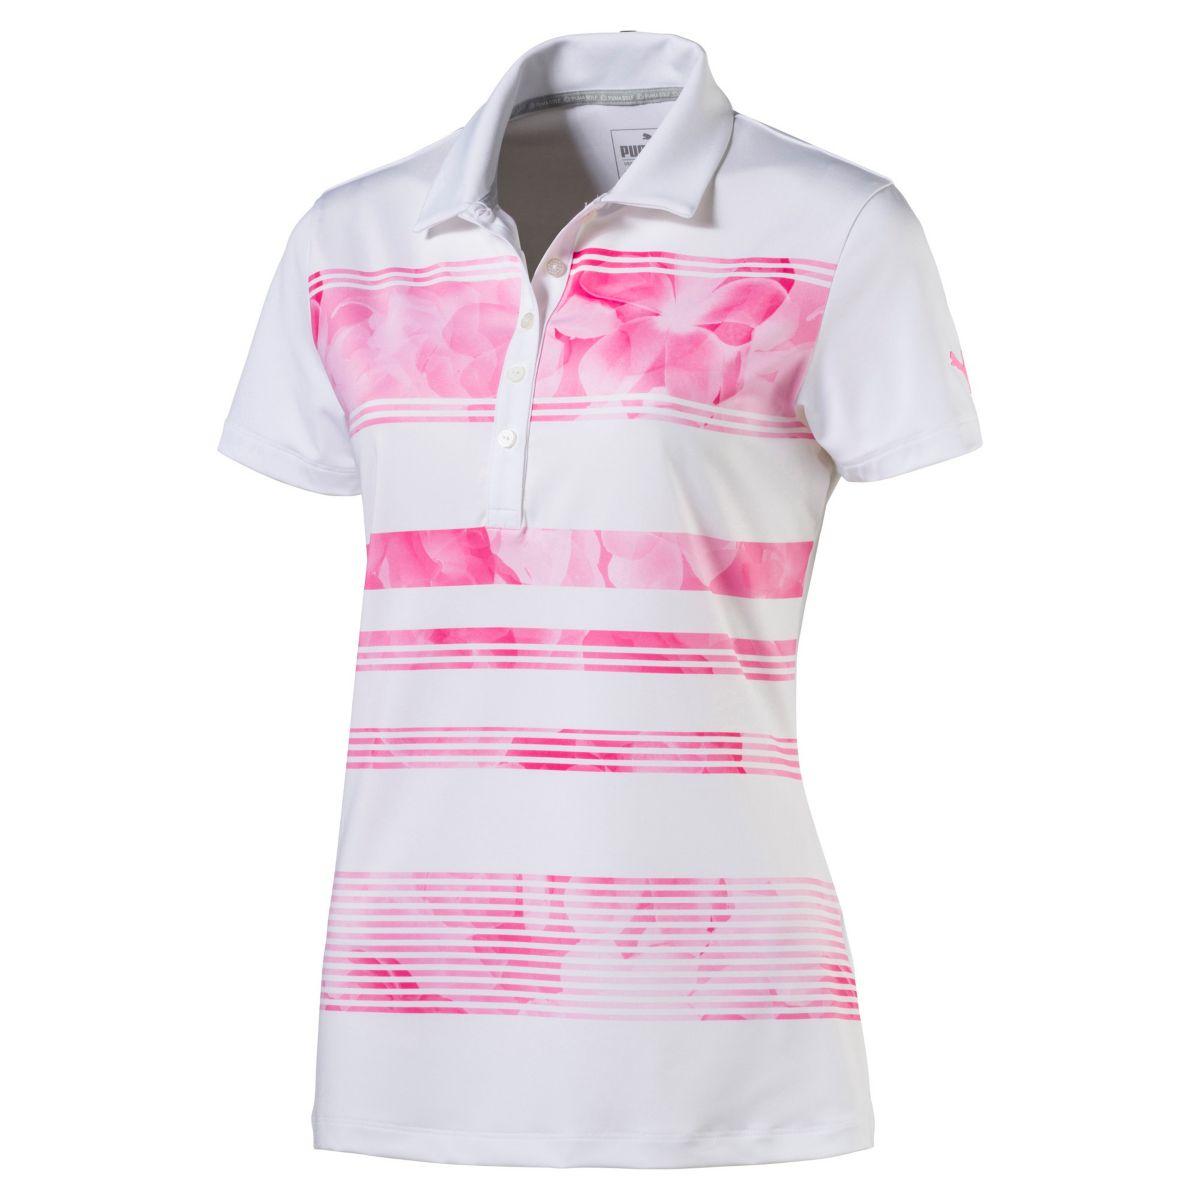 Puma Women's Bloom Stripe Polo Pink